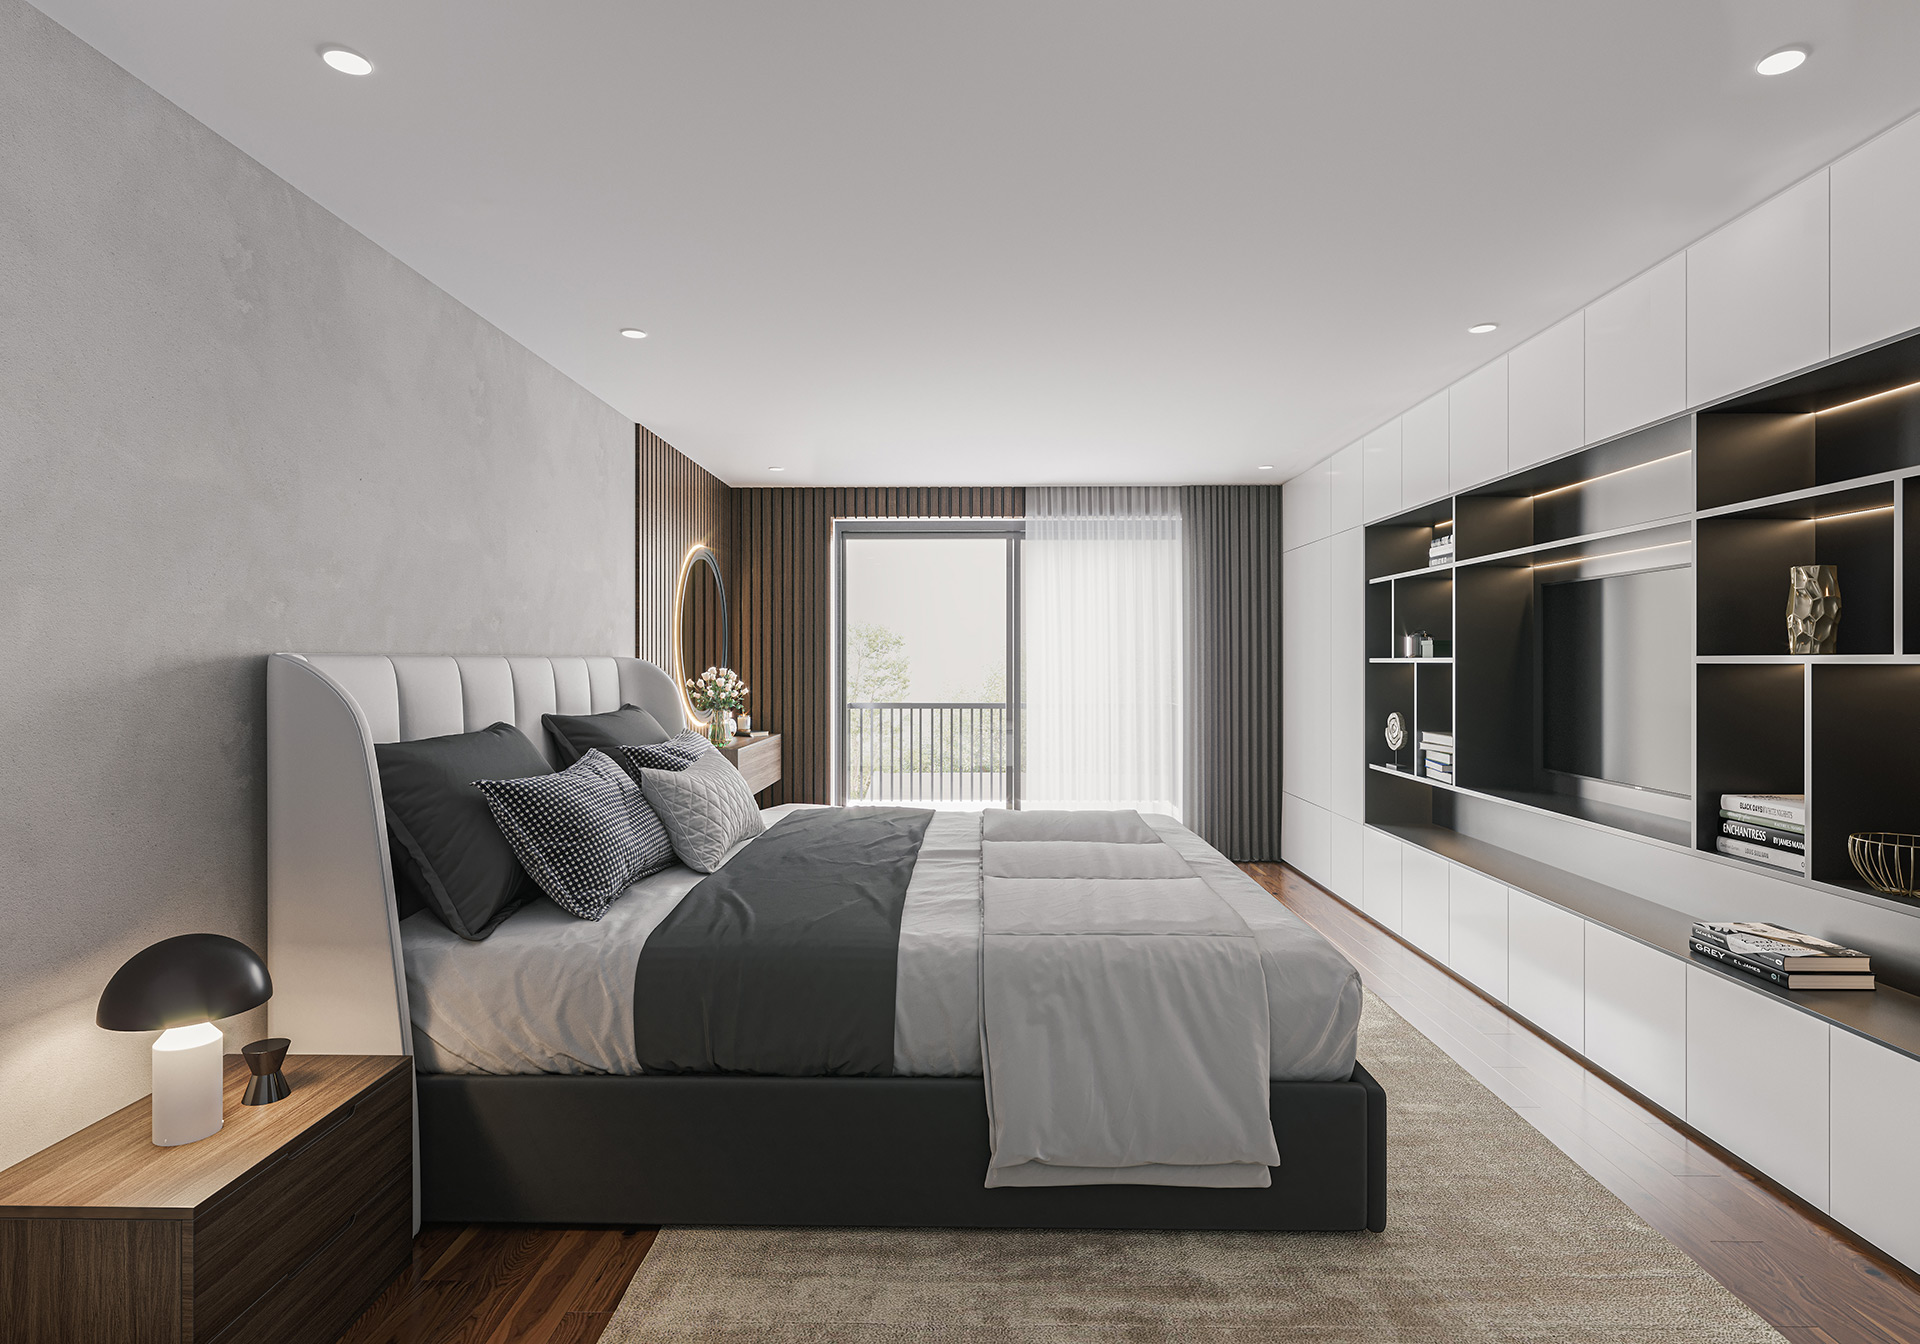 Chigwell Interior Bedroom Rendering